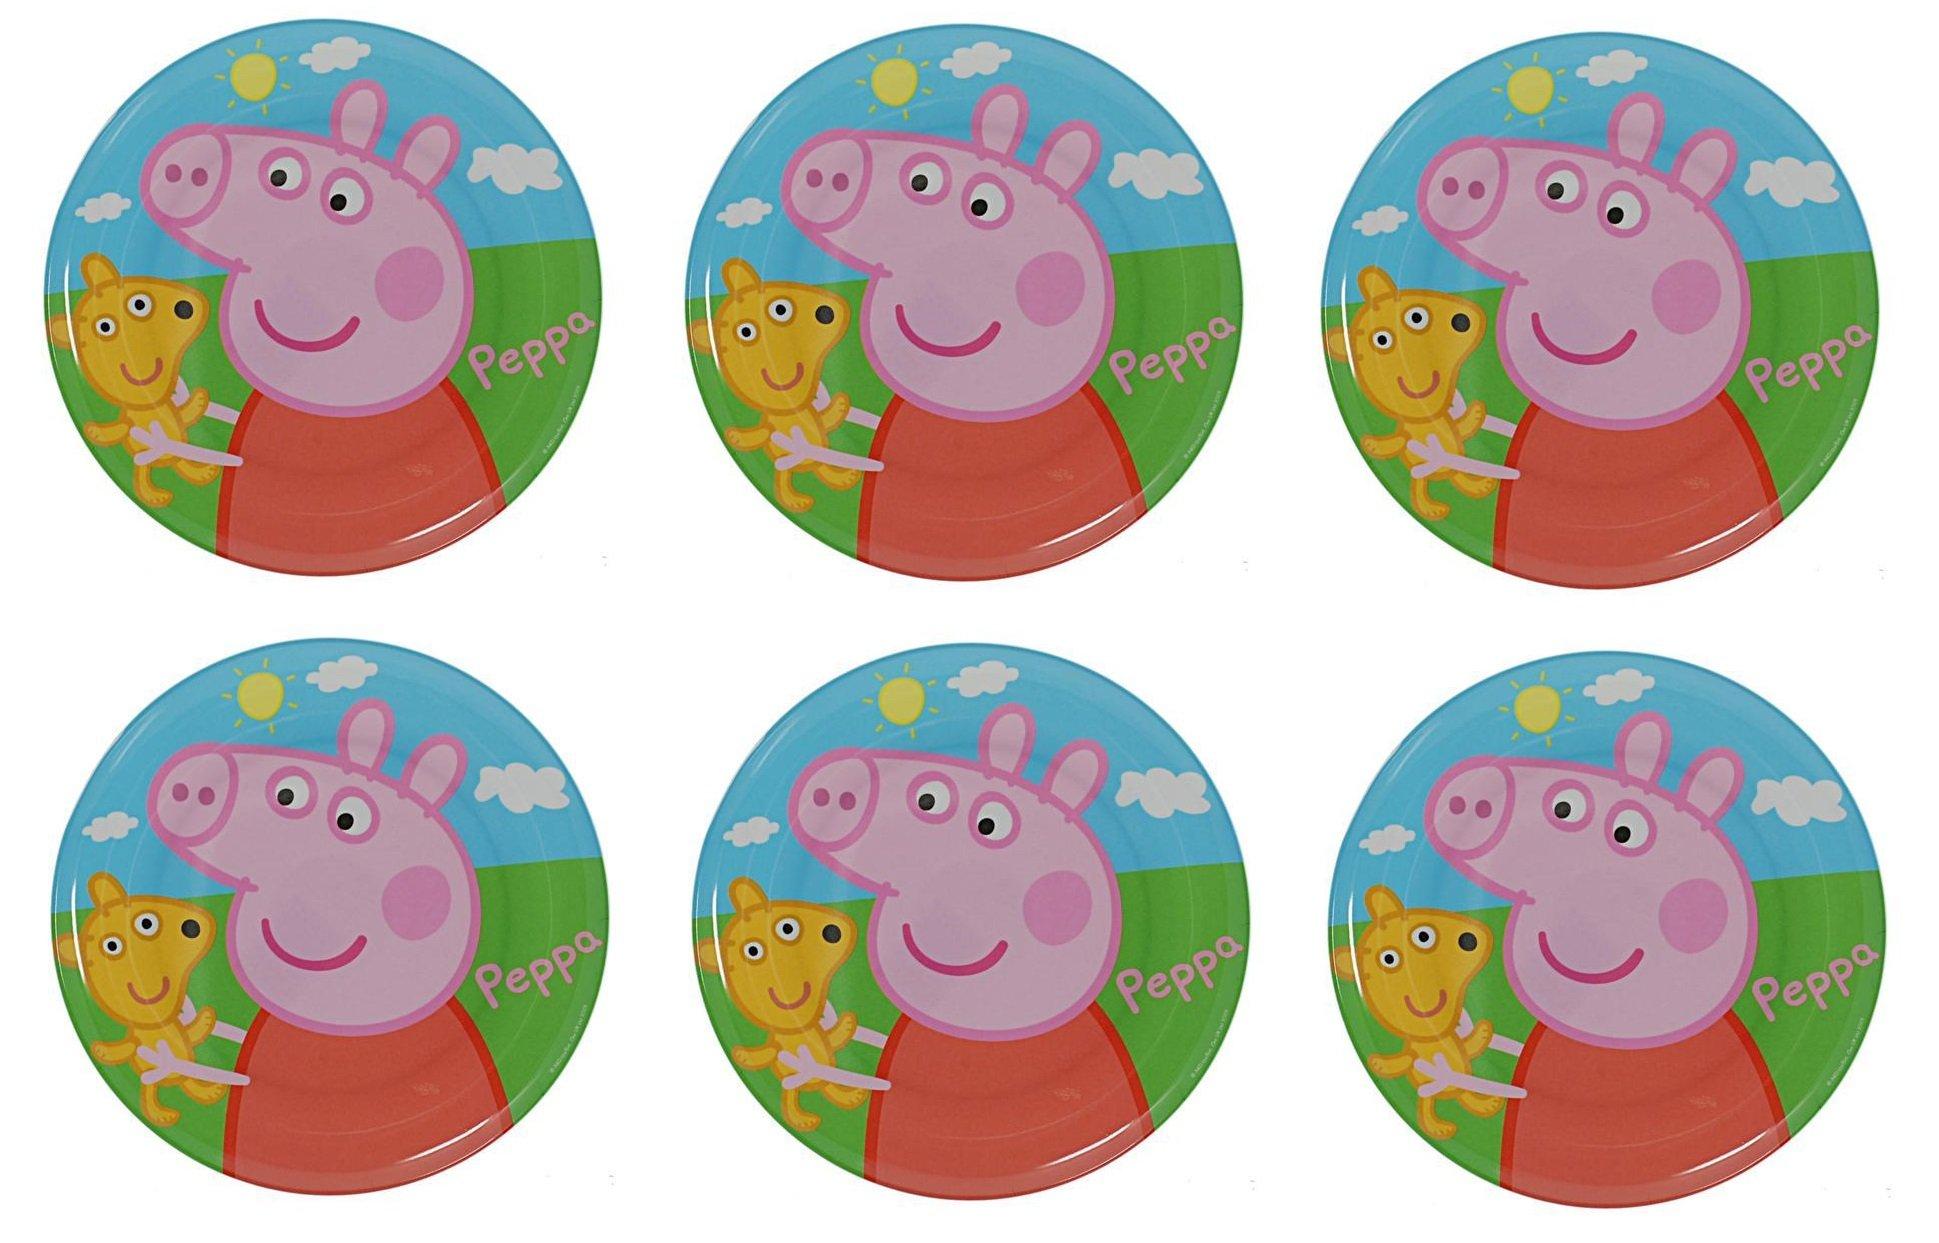 Set of 6 Peppa Pig Melamine Plates 8'' Diameter (20cm) by BWR (Image #1)